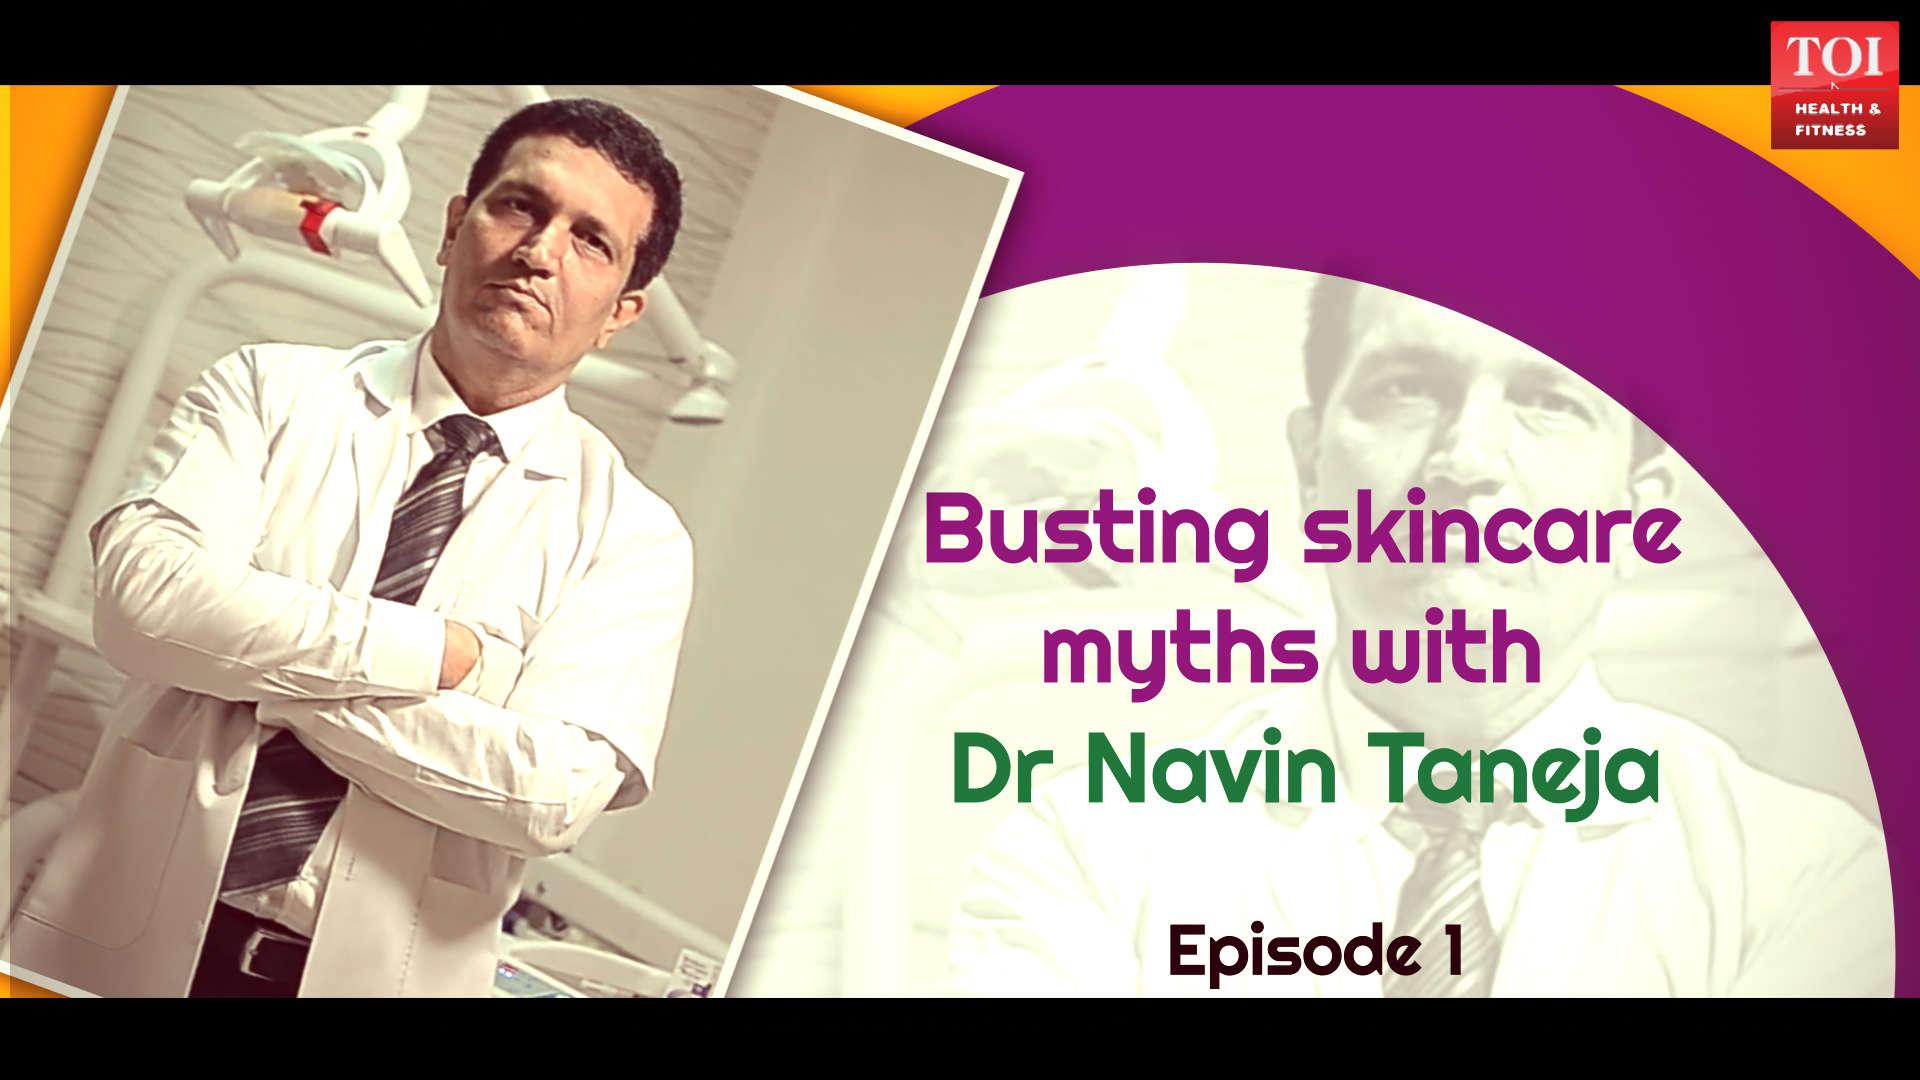 Busting skincare myths with Dr. Navin Taneja